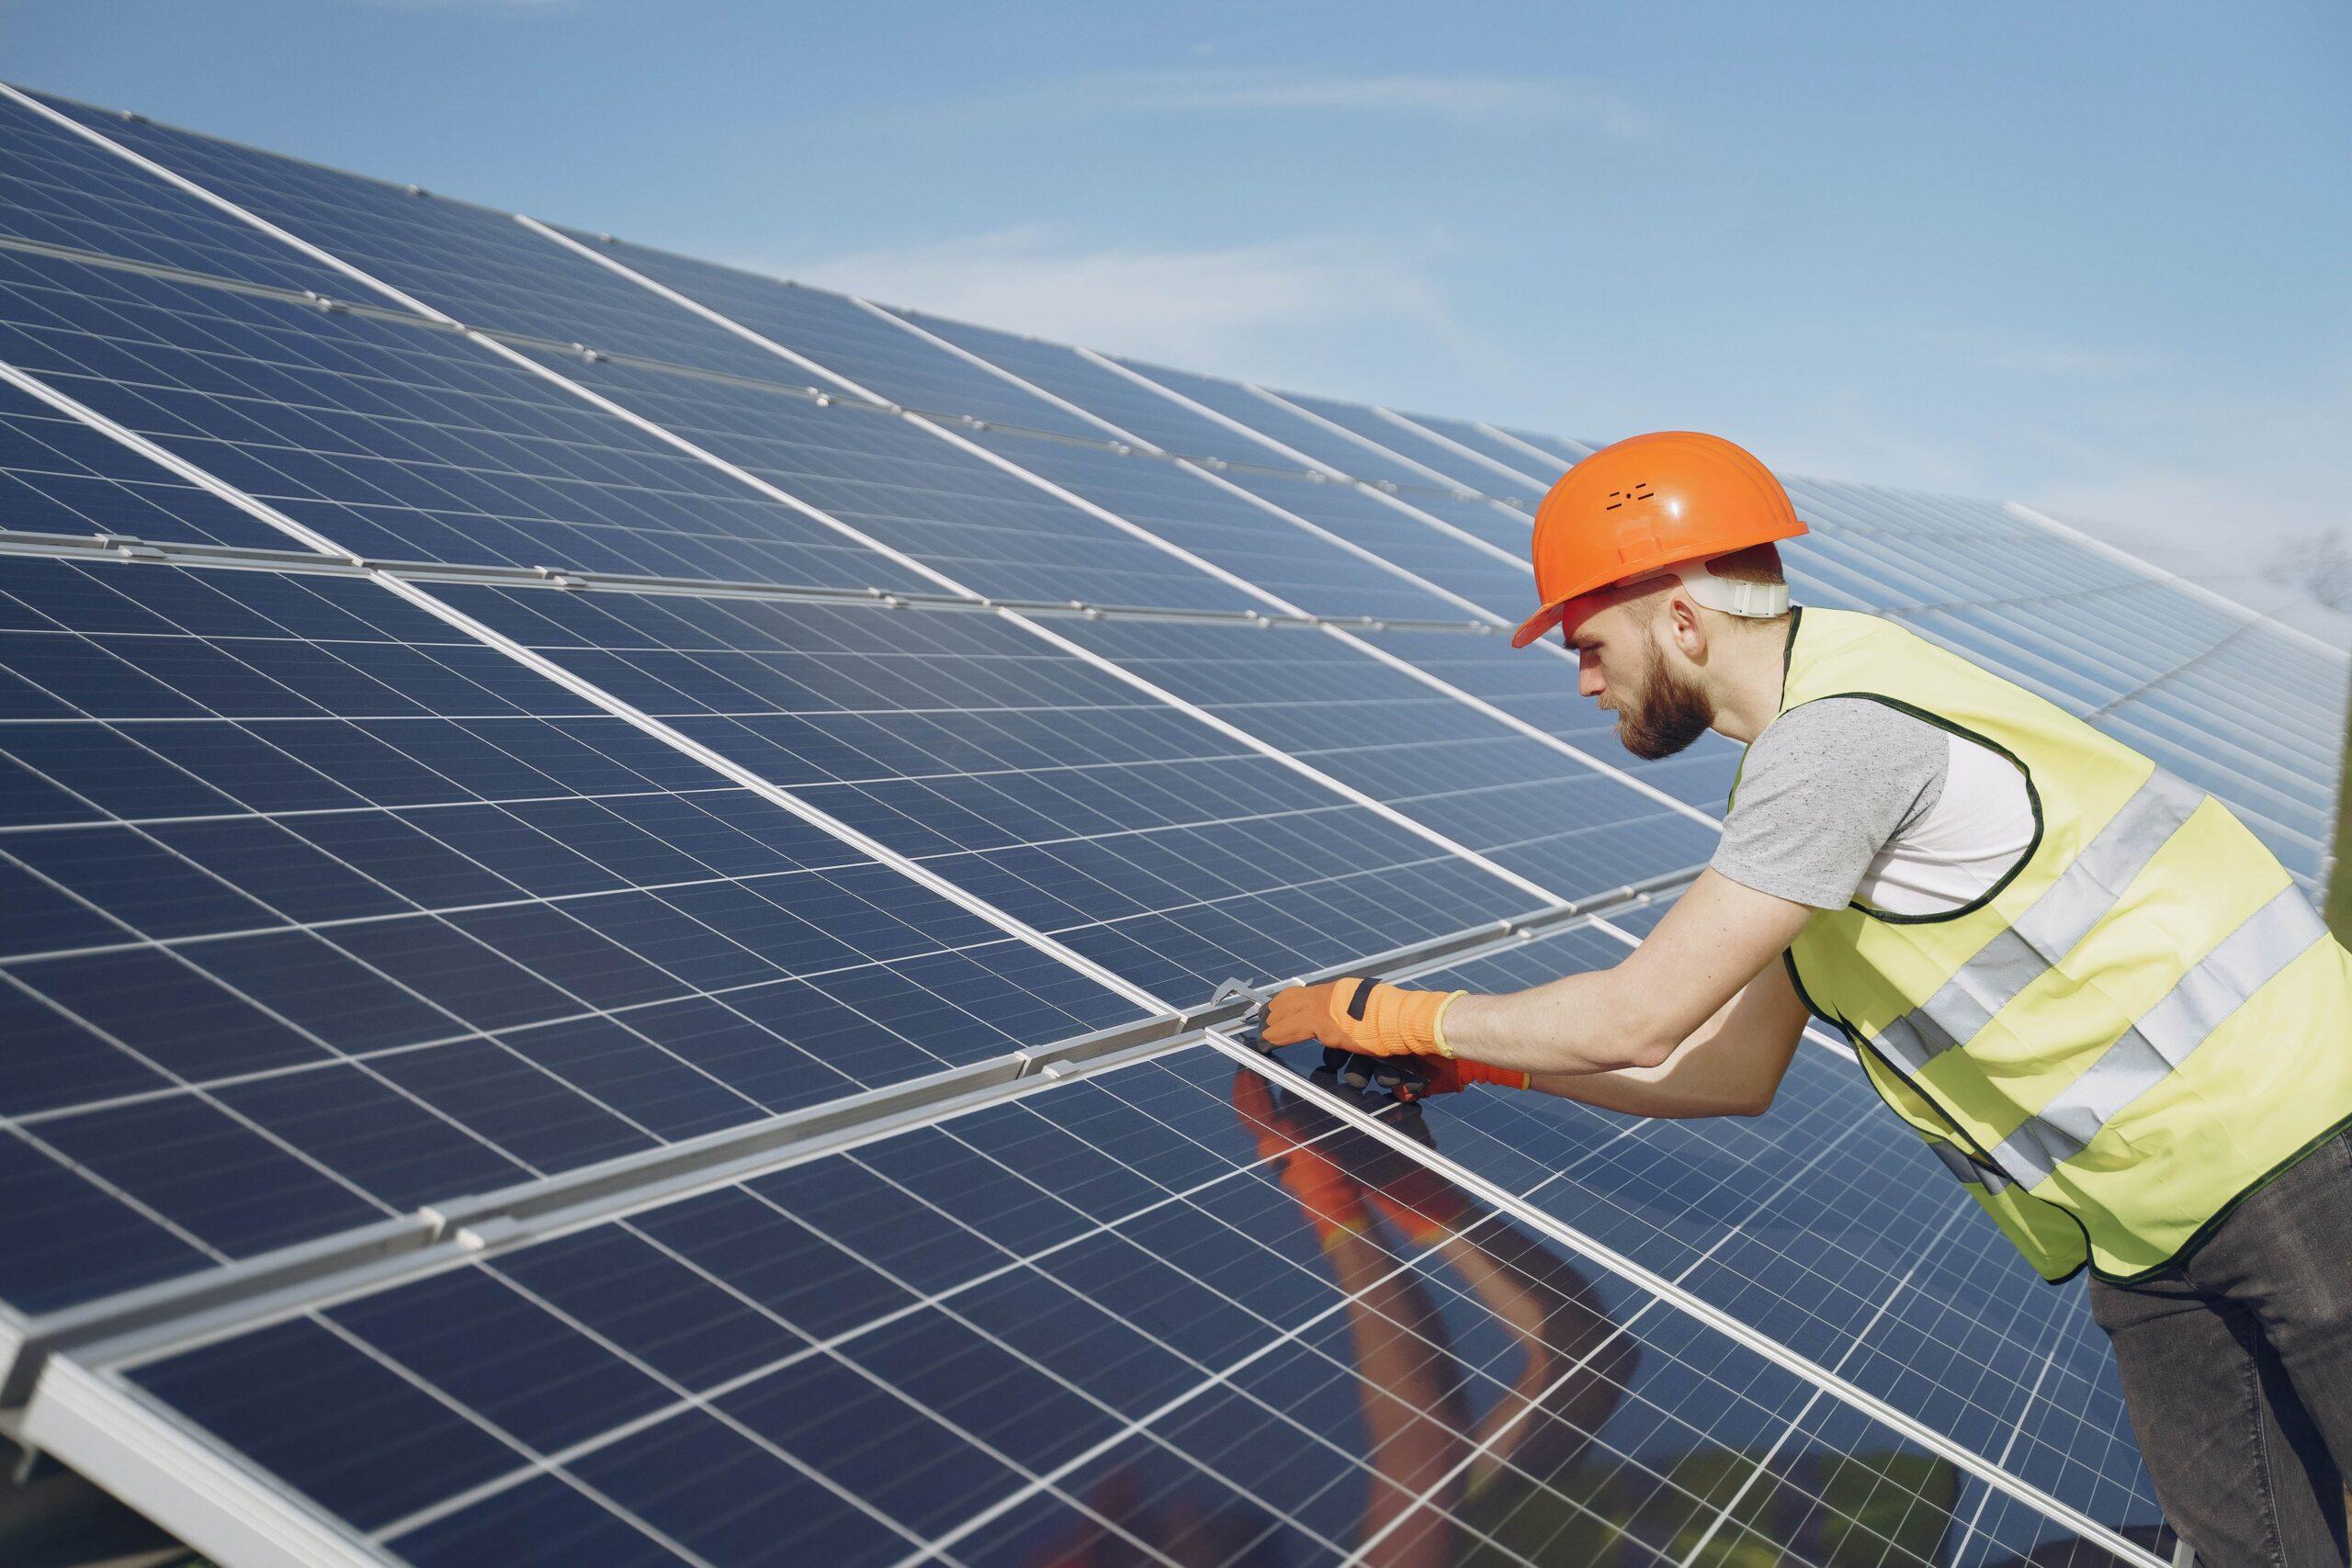 Photovoltaik und Elektroinstallation